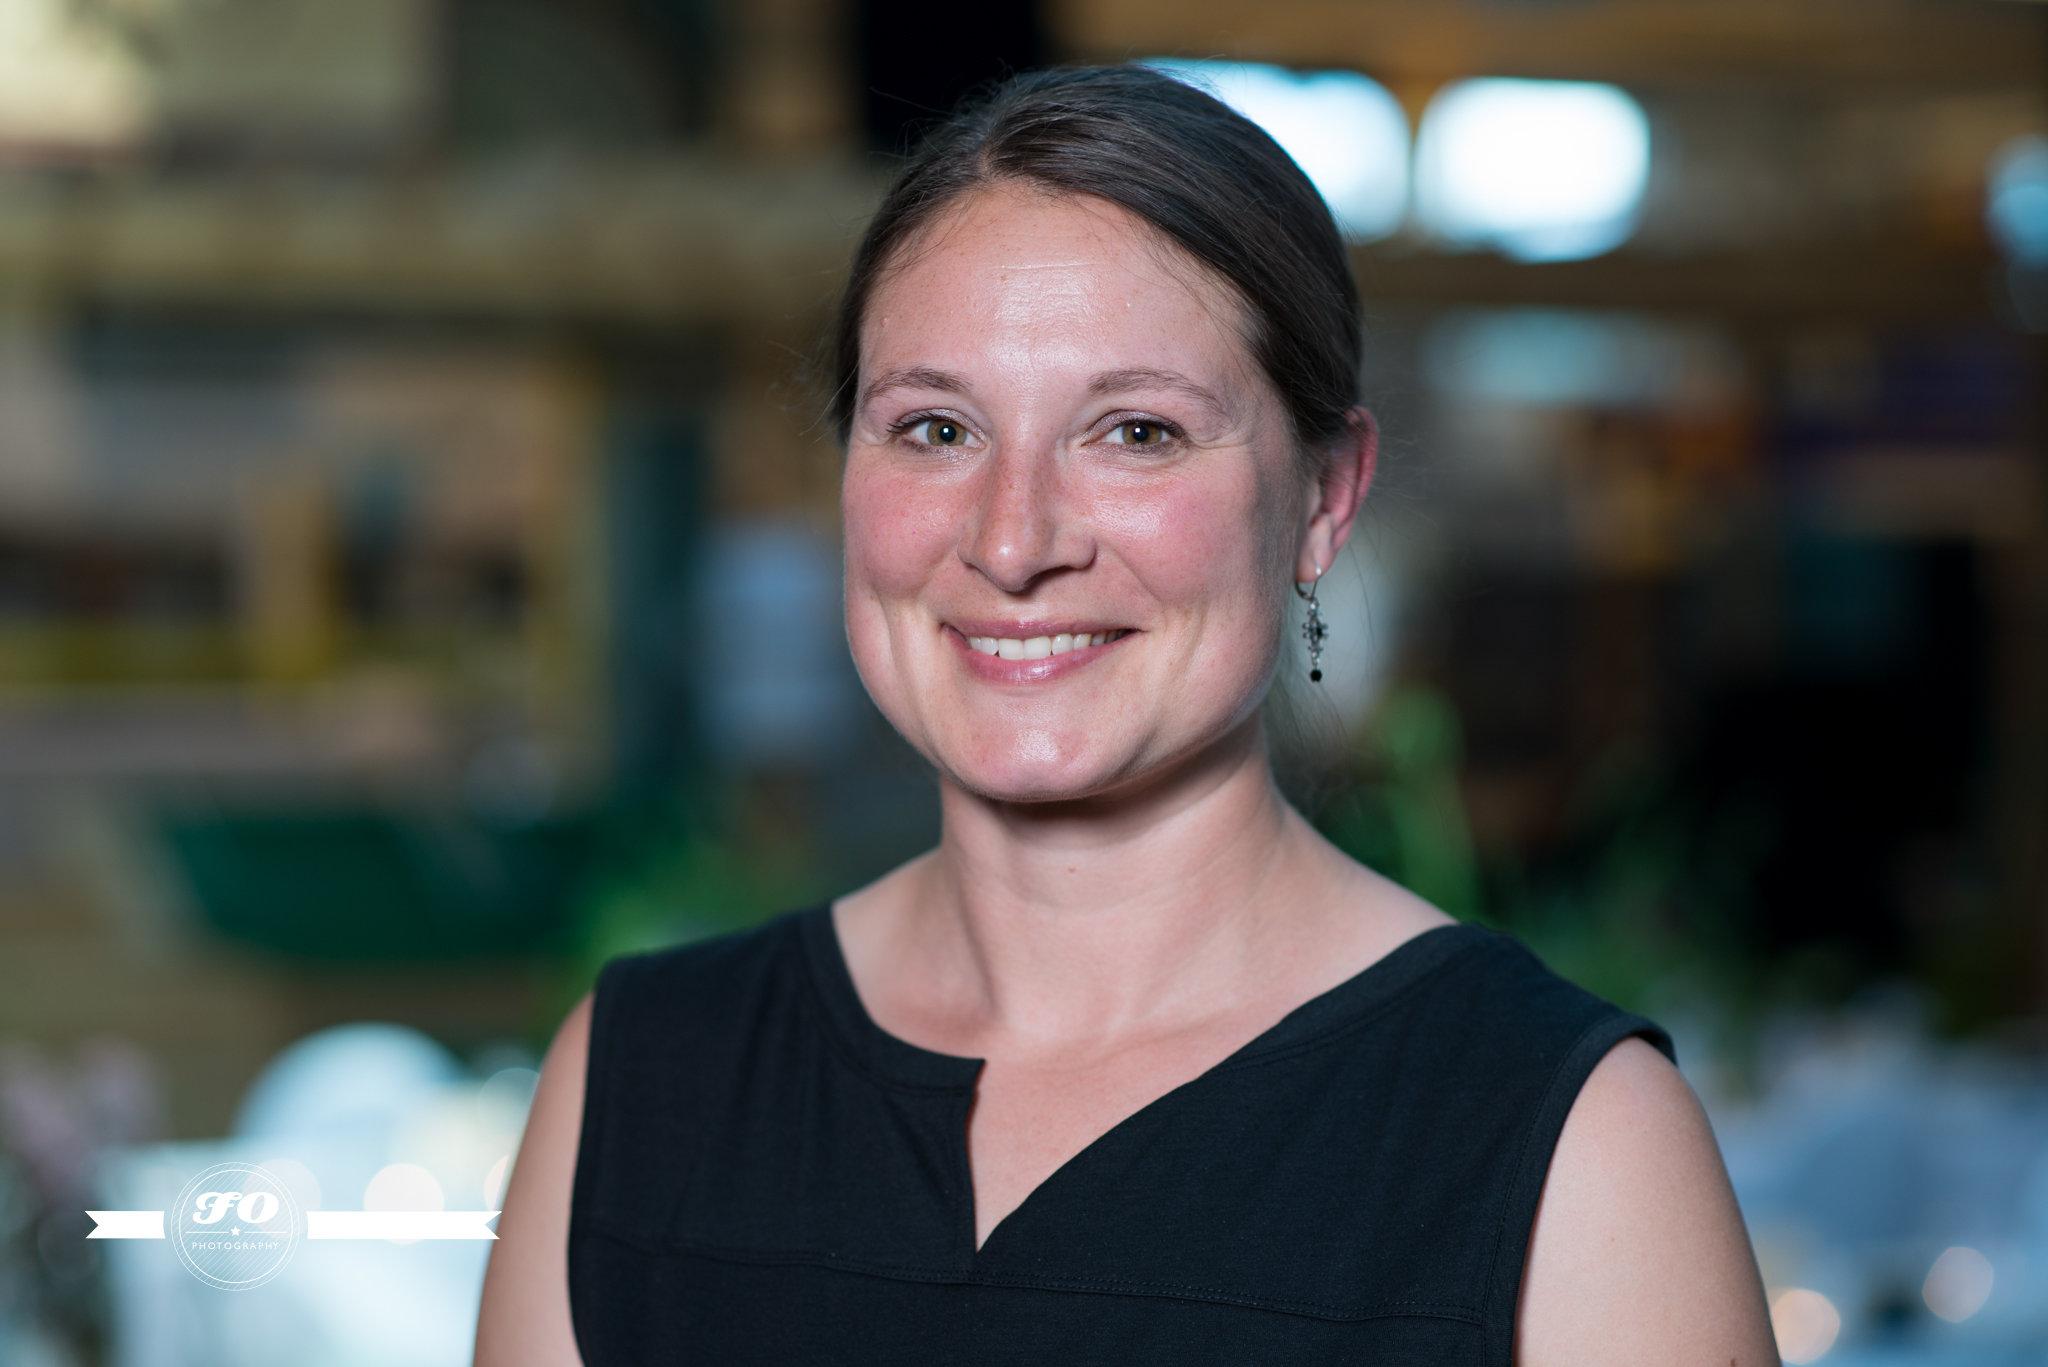 Amanda VanSpronsen